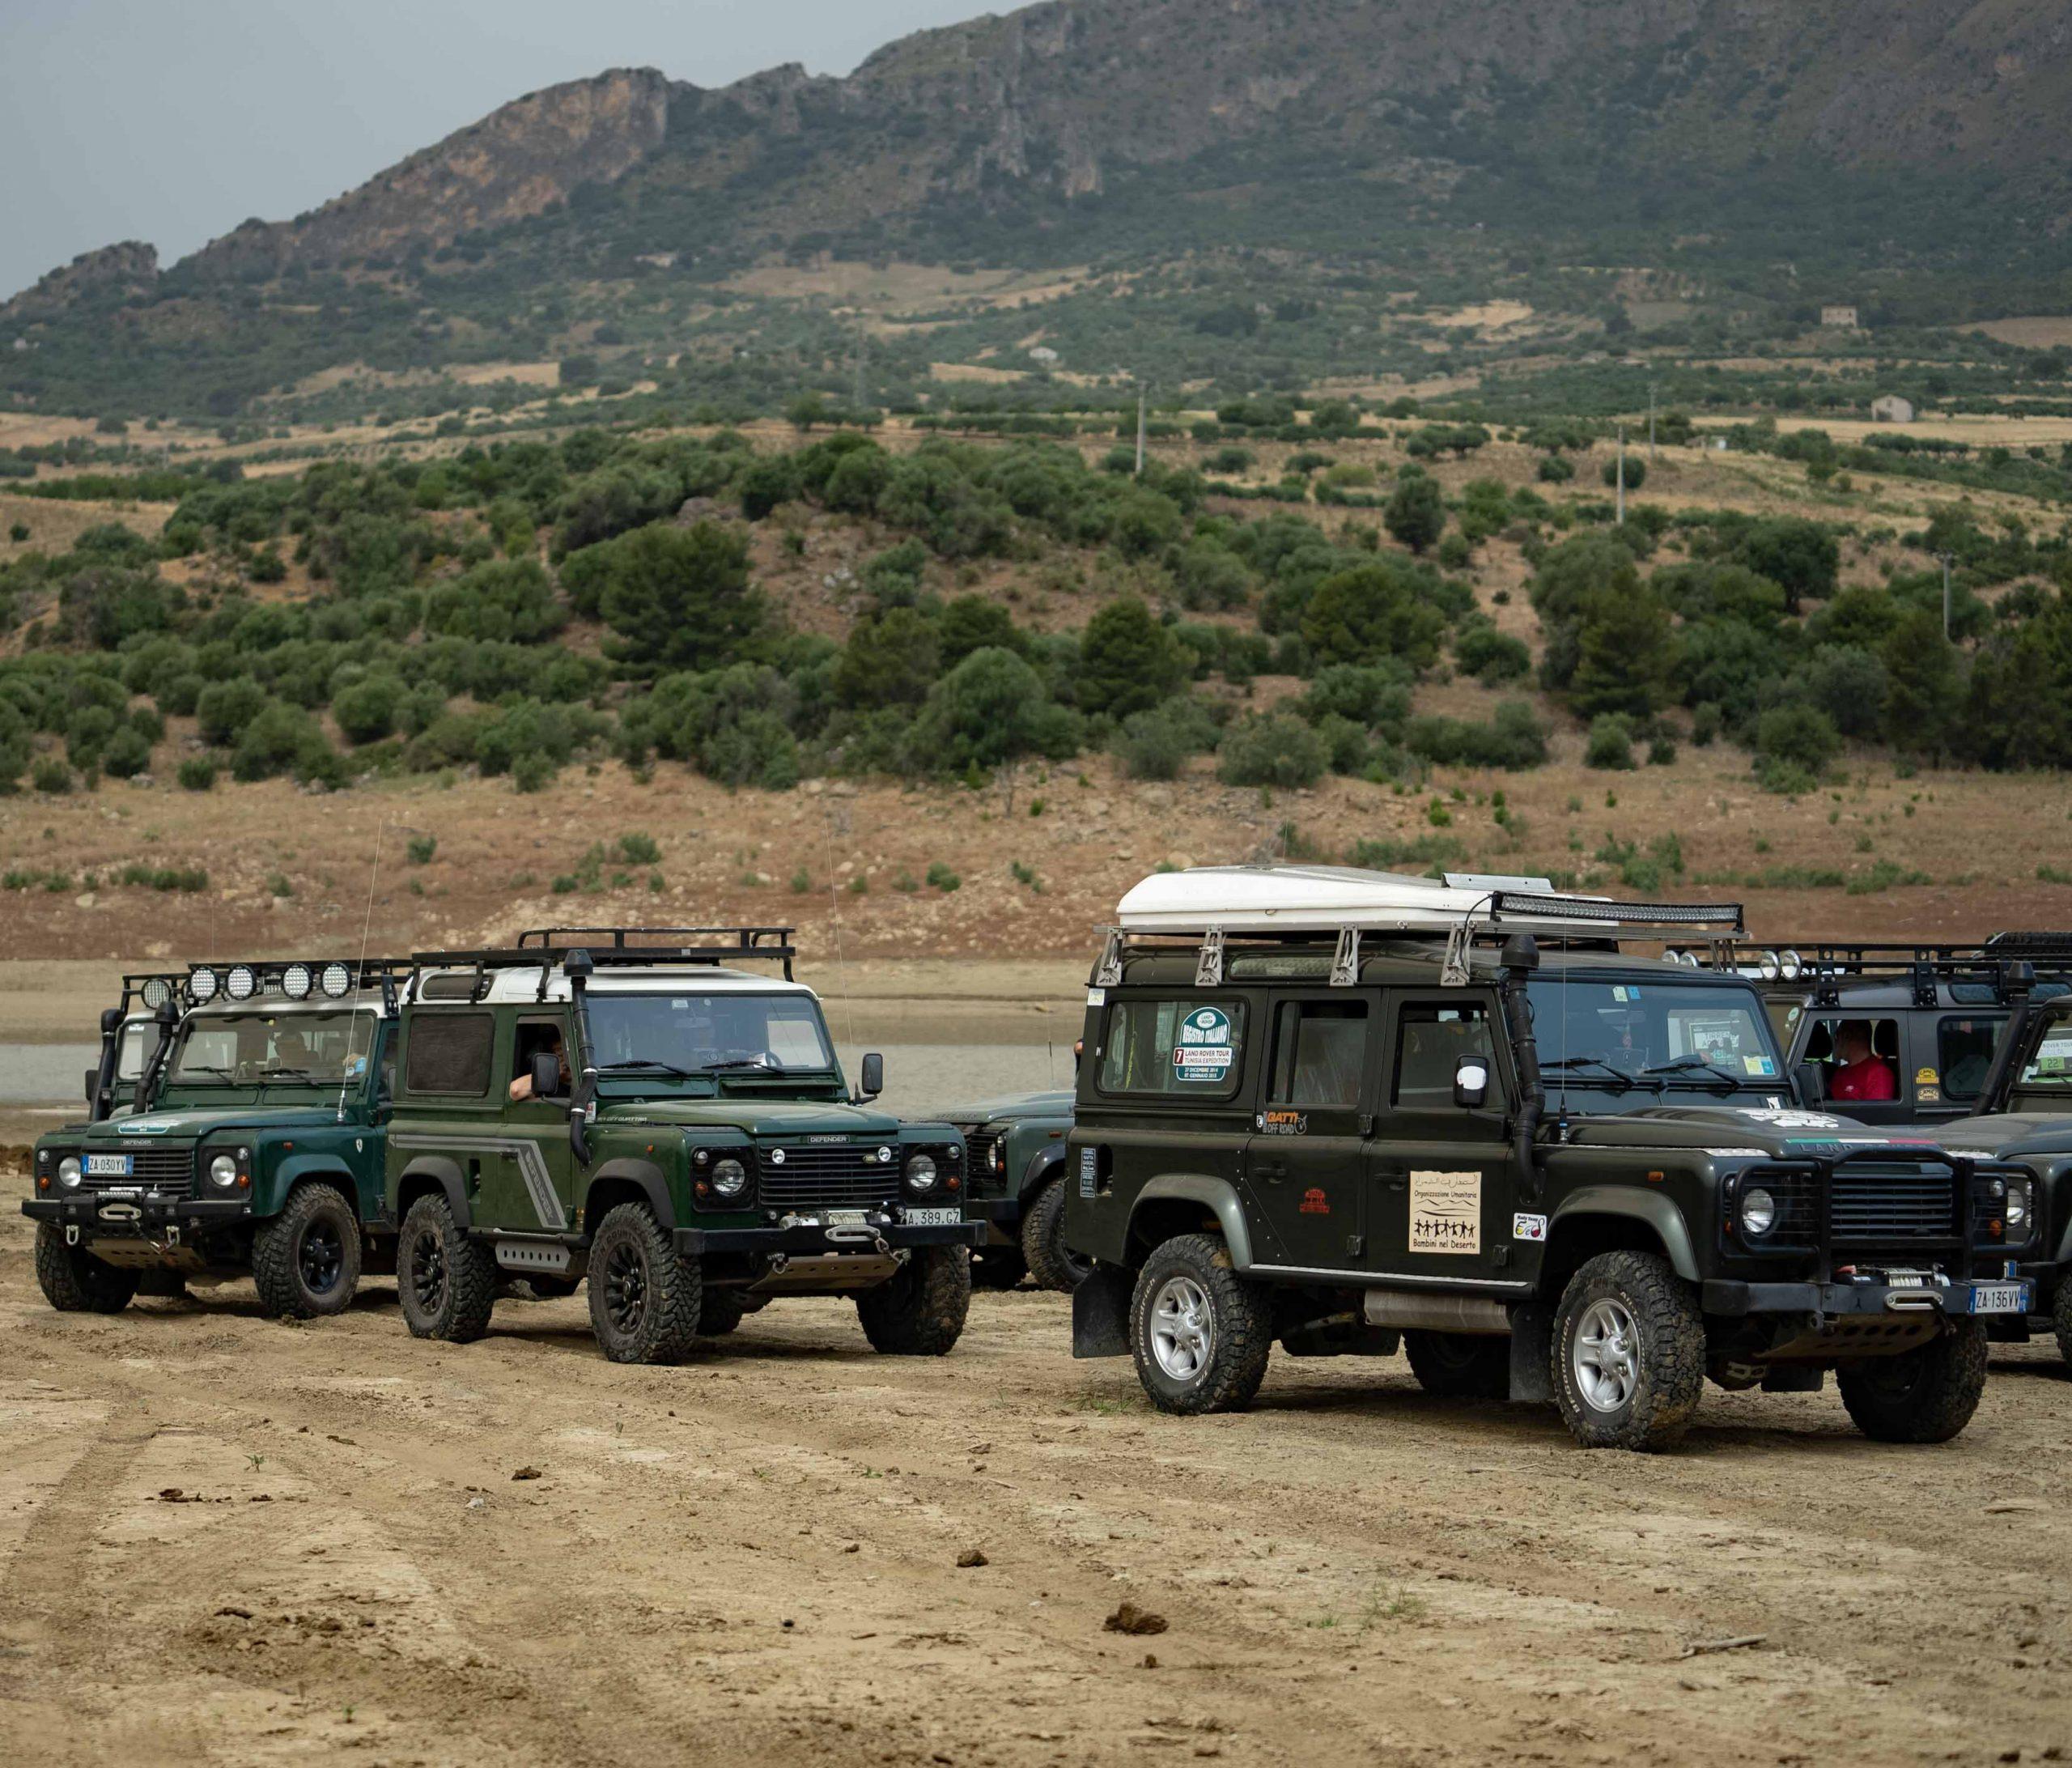 Land_Rover_Tour_Sicilia_2021_Land_Rover_Experience_Italia_-17